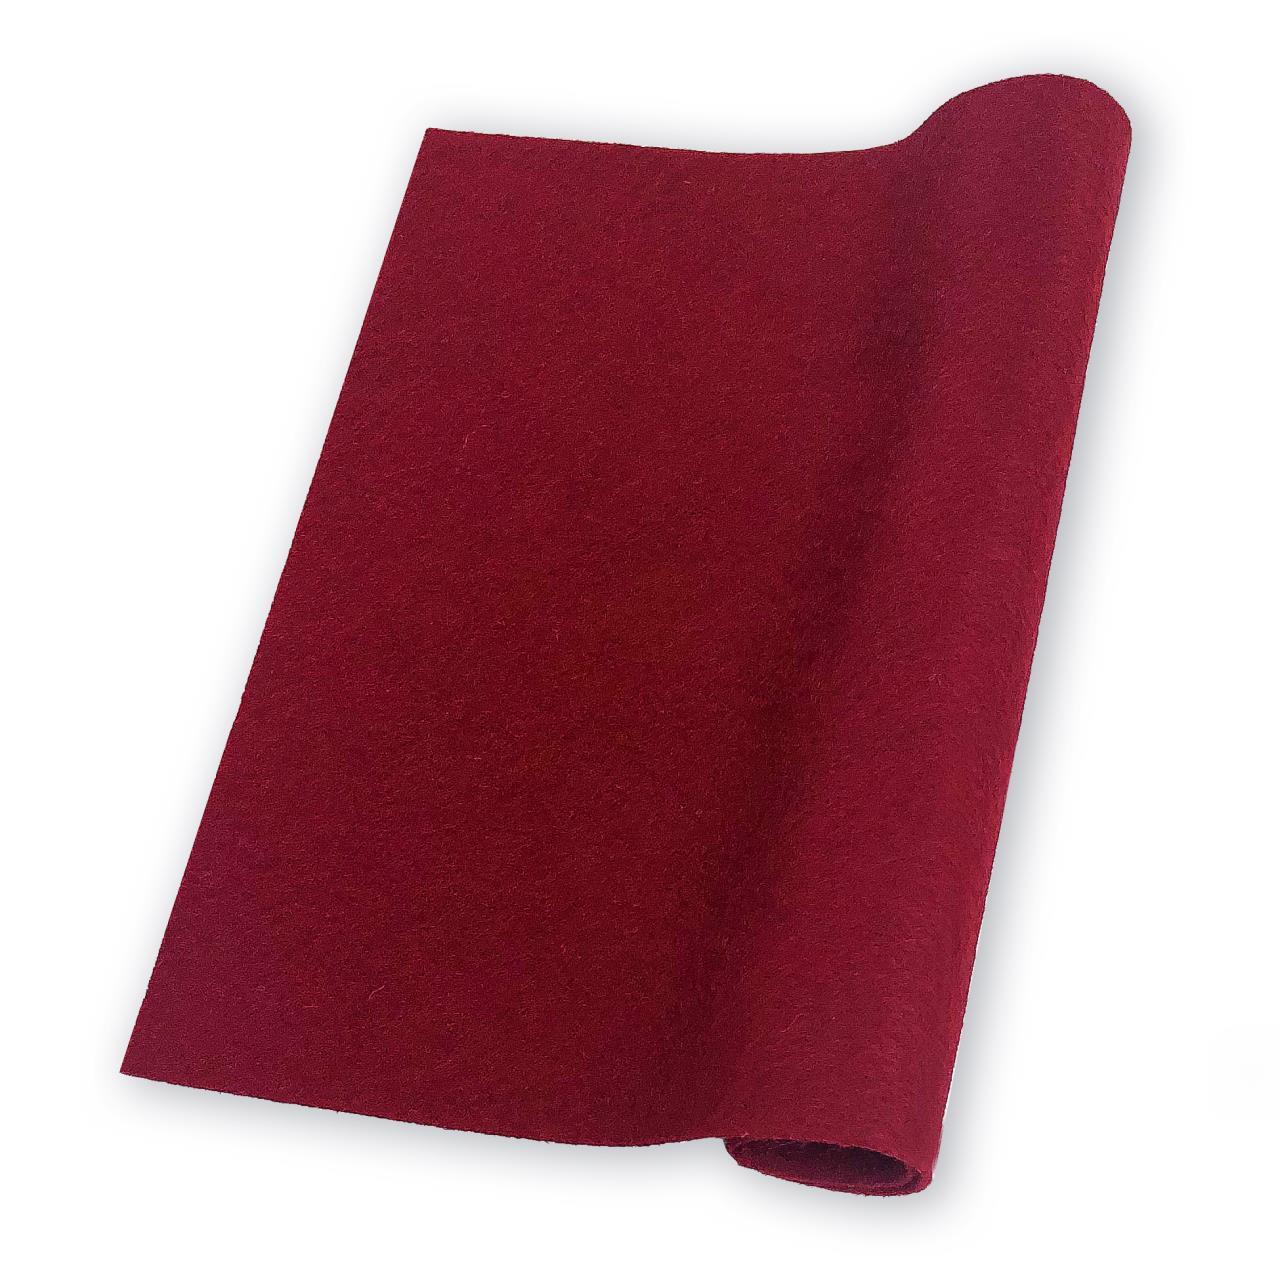 Bordeaux, Essentials By Ellen Wool Felt 9 X 12 - 5 Pk -